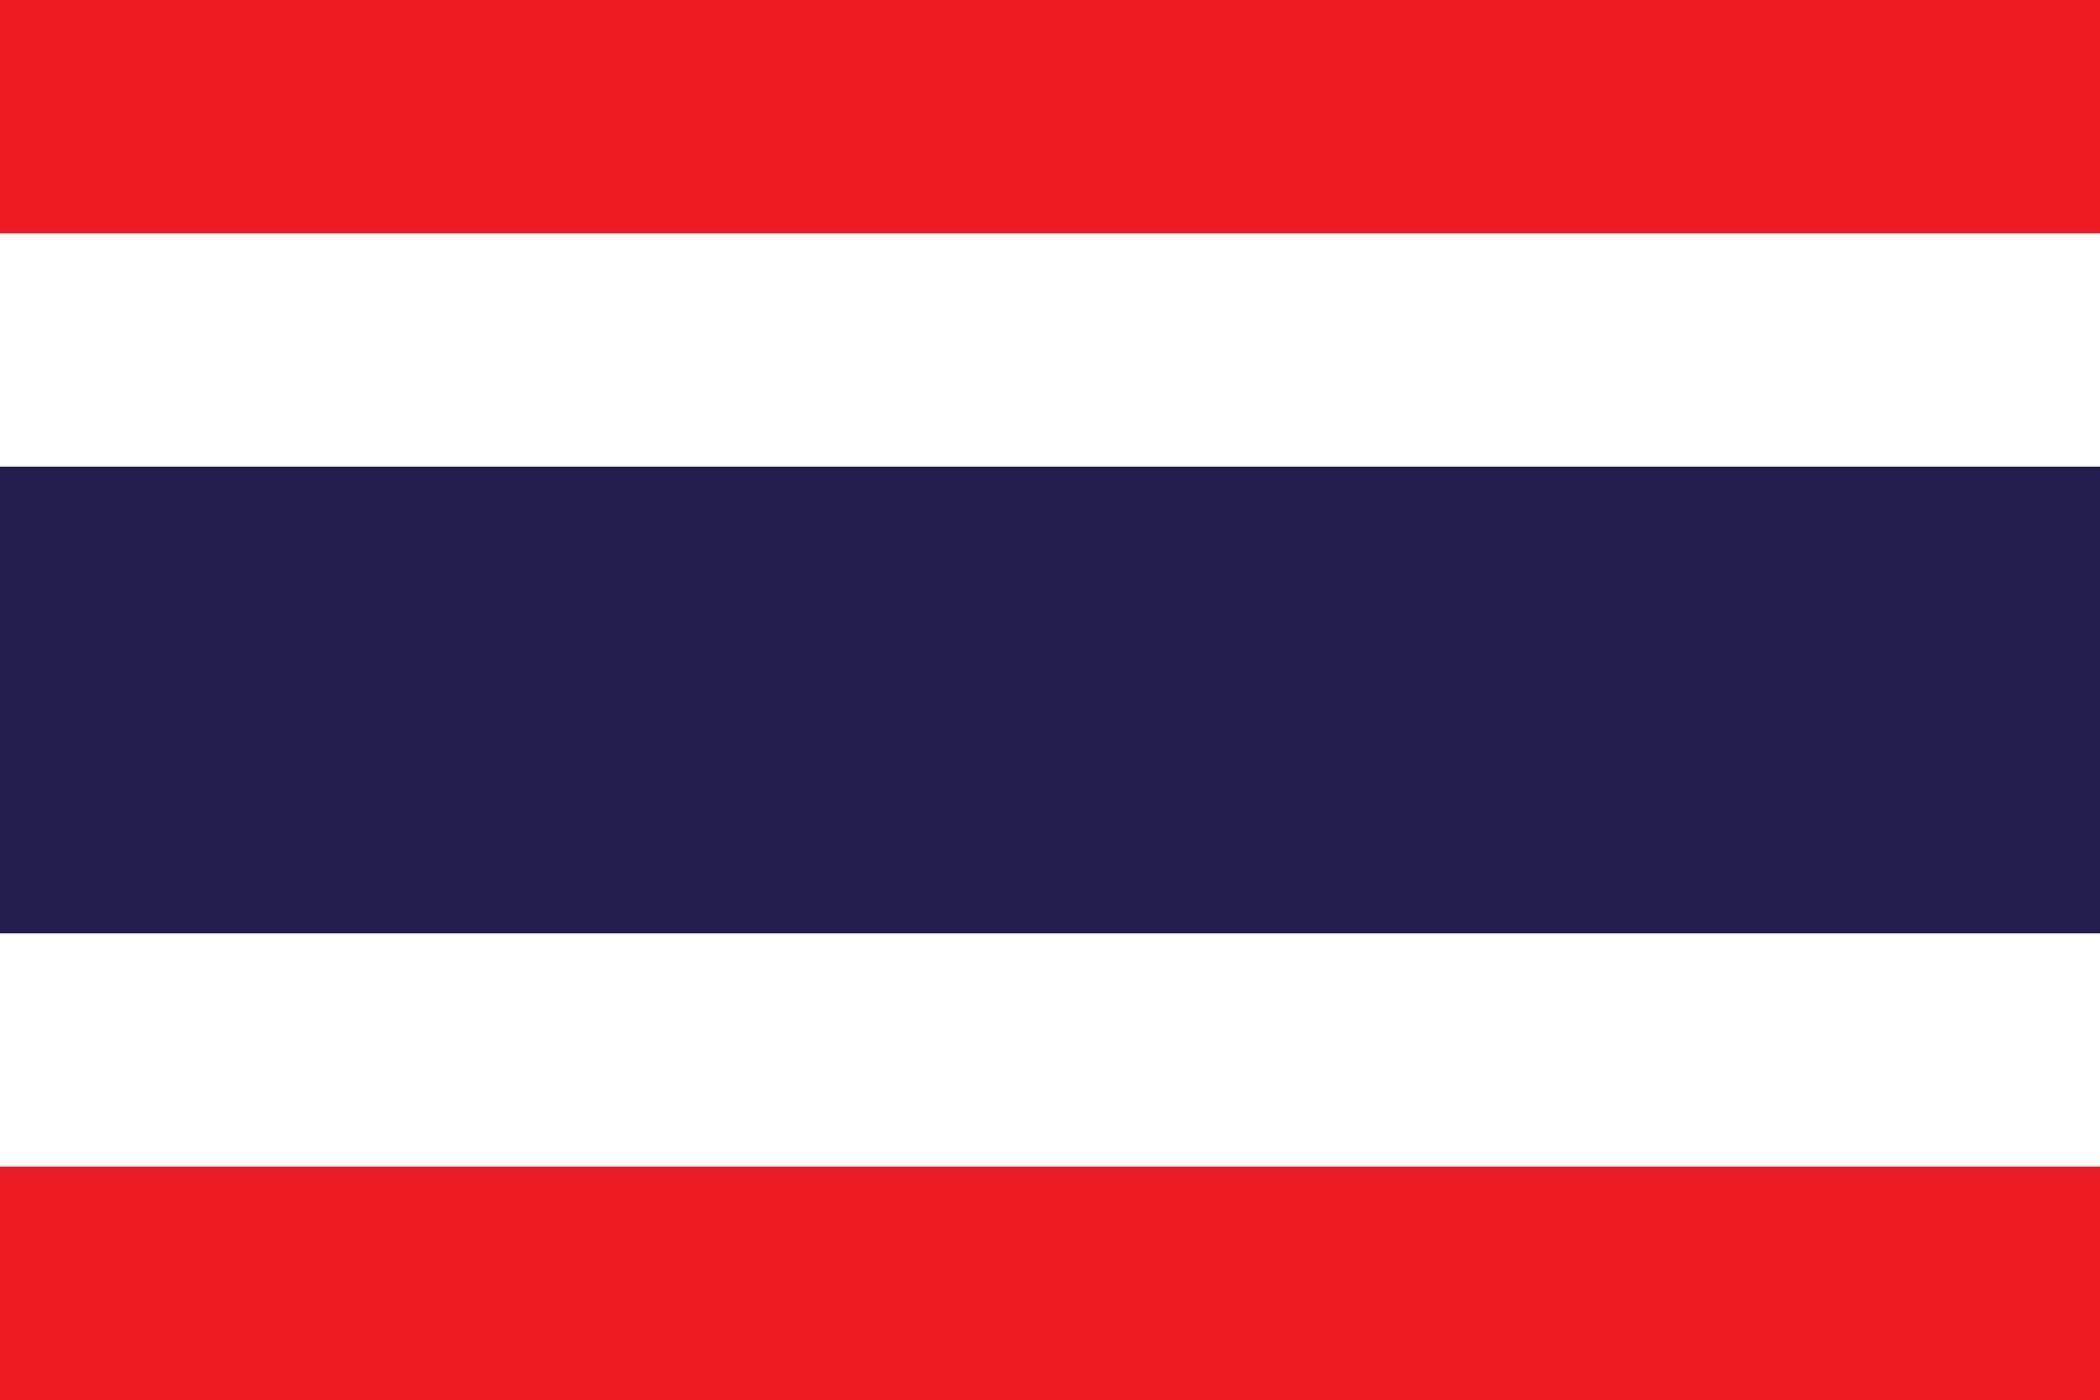 Thailand Flag And Emblem Vector Free Logo Eps Download Thailand Flag Thai Flag Flags Of The World